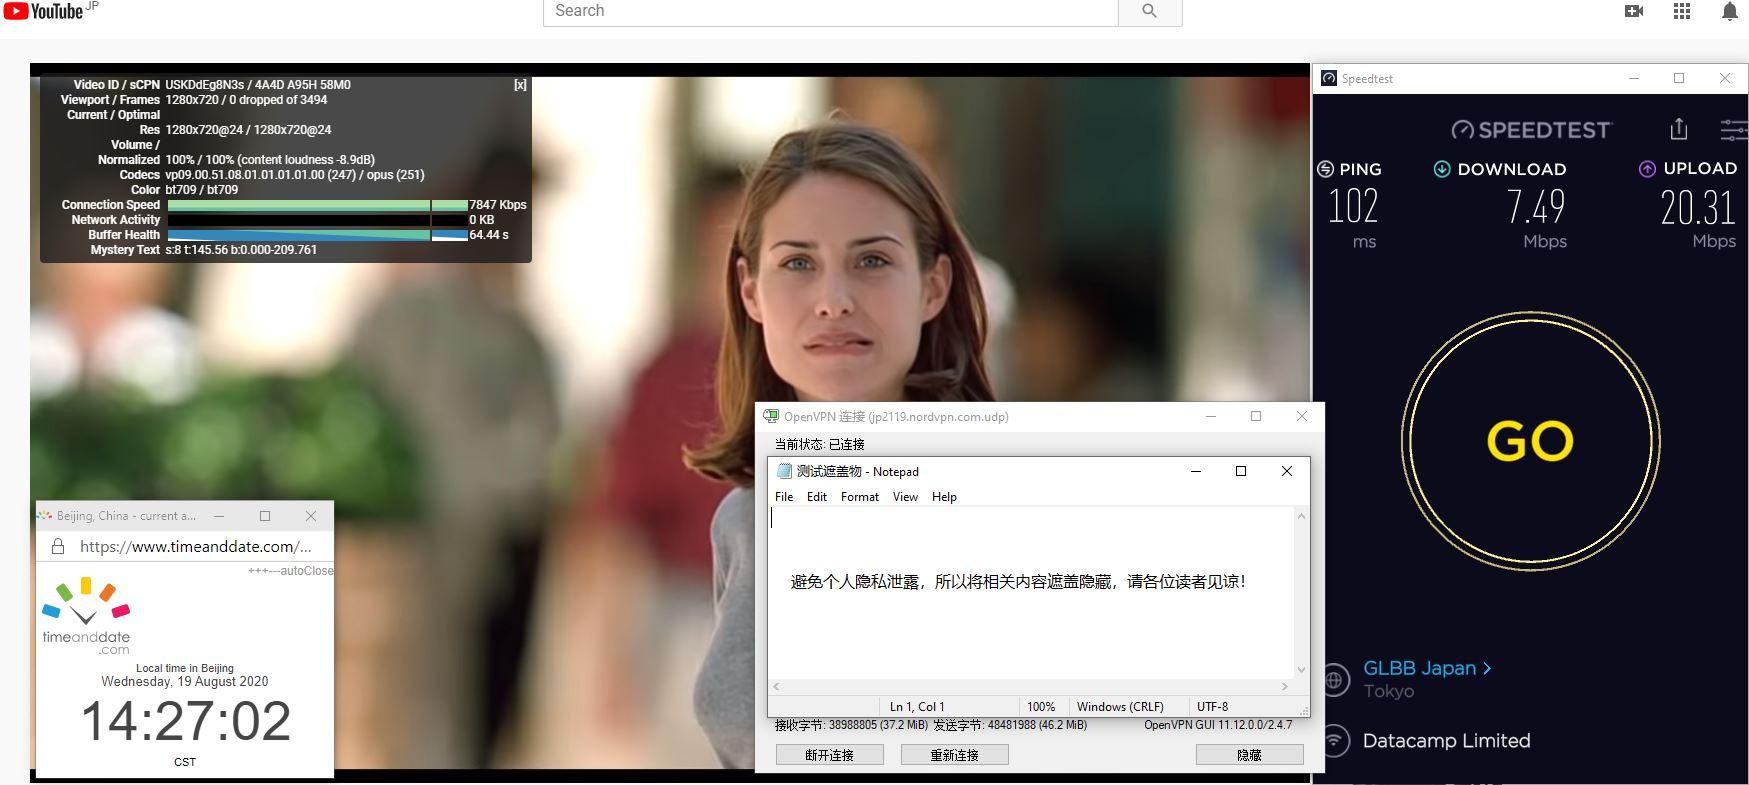 Windows10 NordVPN OpenVPN jp2119 中国VPN 翻墙 科学上网 翻墙速度测试 - 20200819